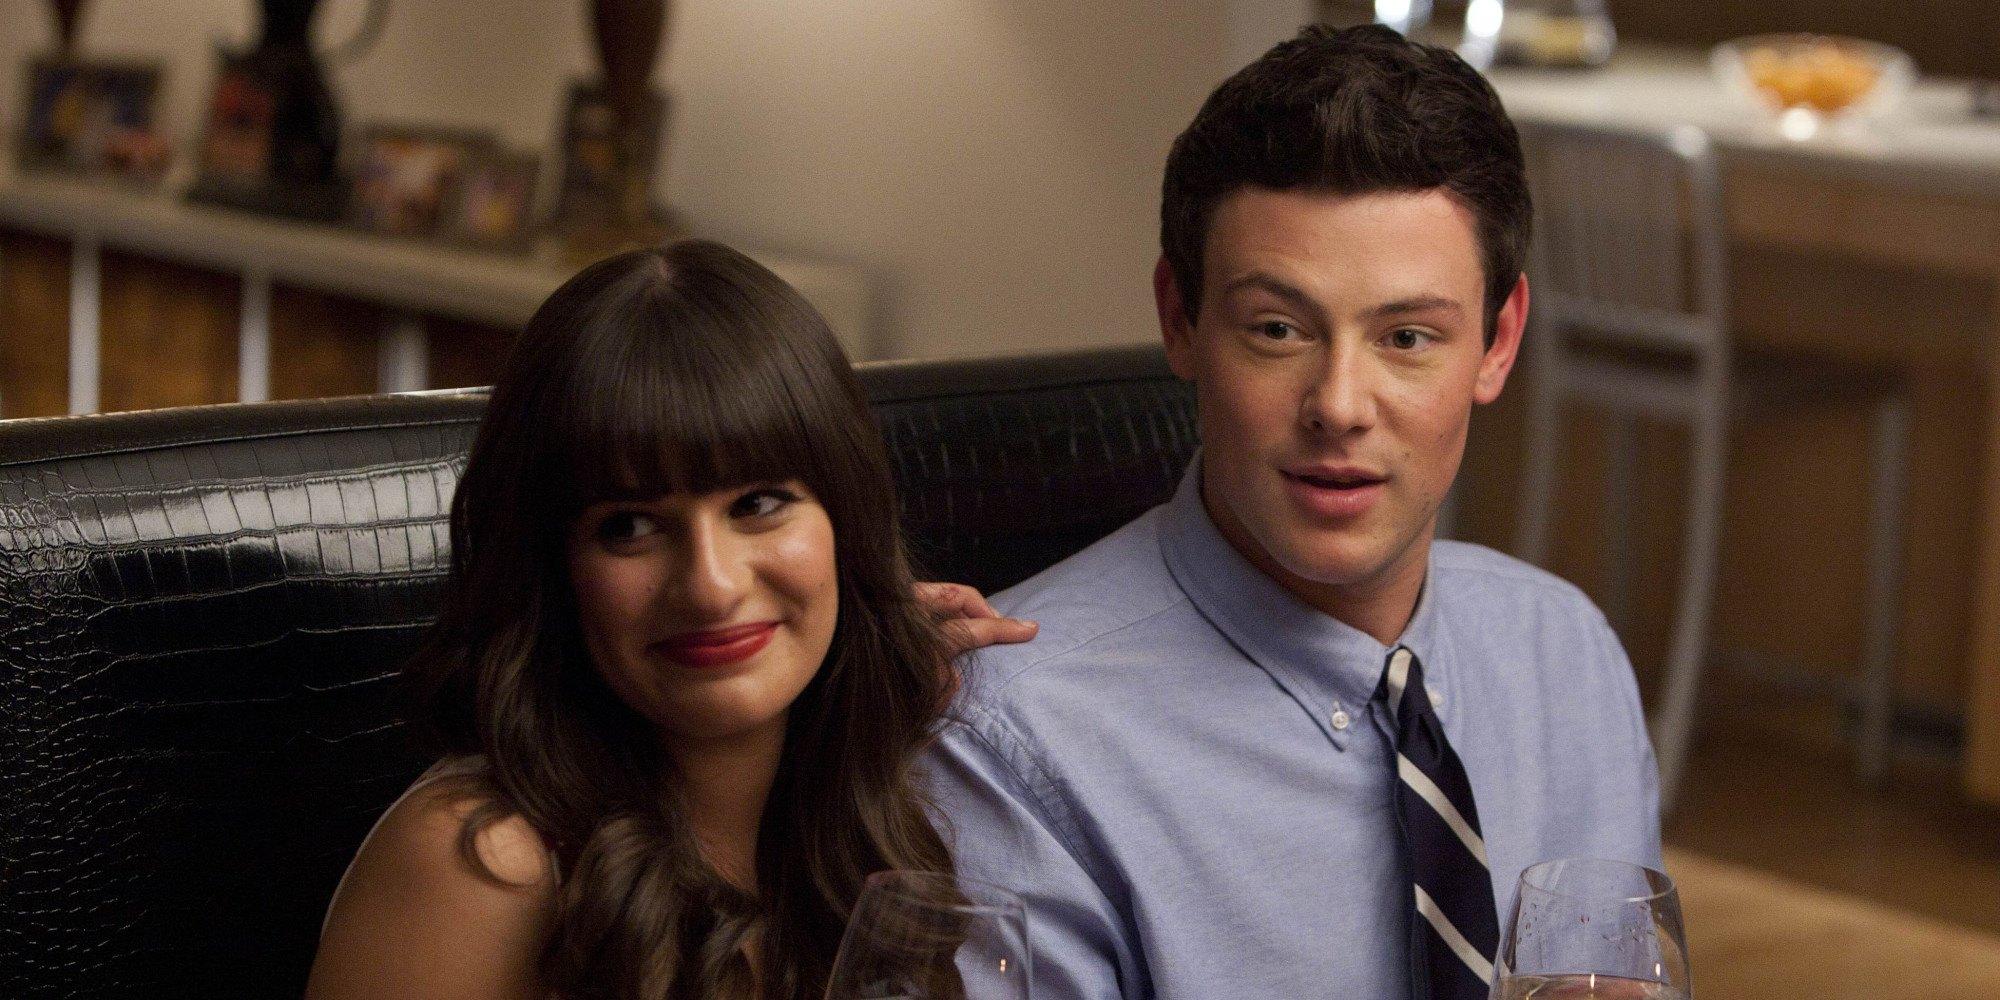 Lea Michele as Rachel Berry and Cory Monteith as Finn Hudson on Glee